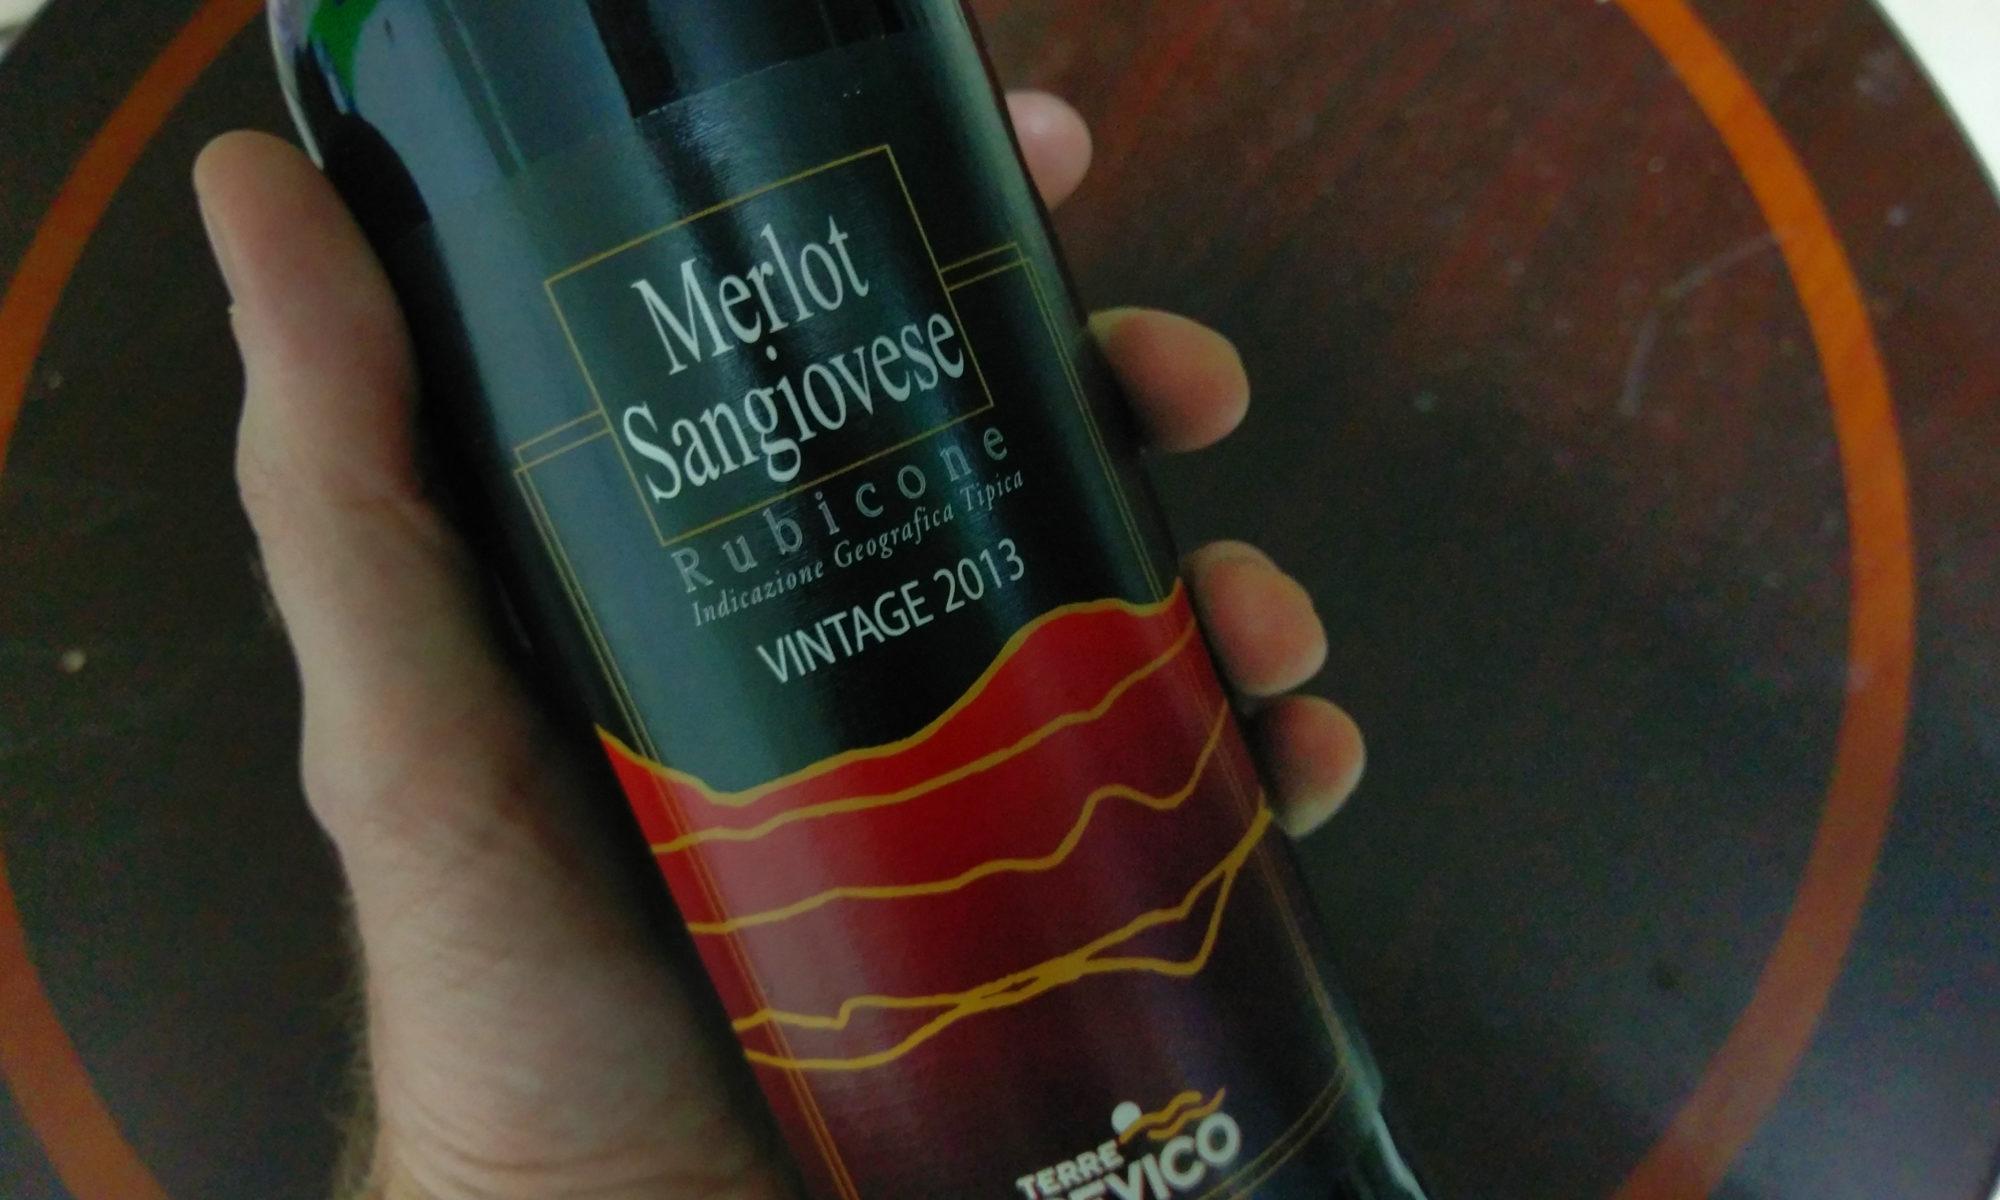 Rubicone Merlot Sangiovese 2013